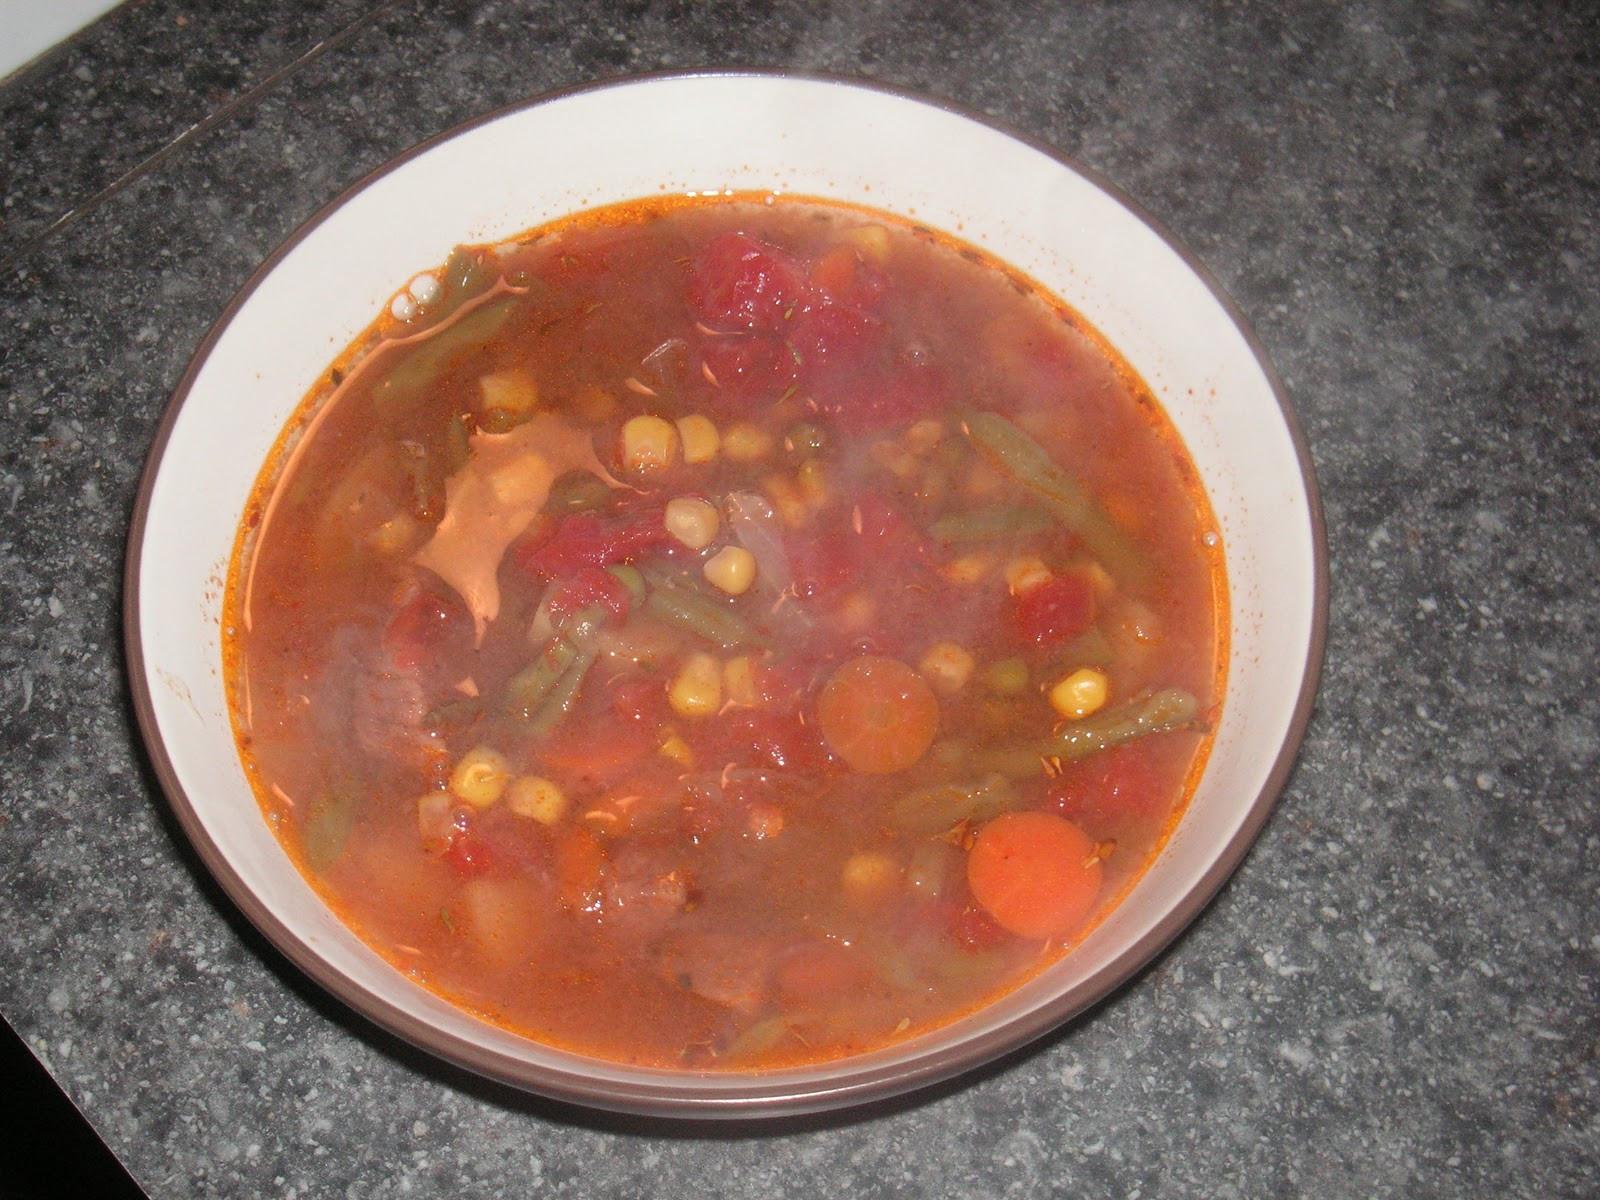 Vegetable Beef Soup Crock Pot  Crock Pot Beef Ve able Soup Hezzi D s Books and Cooks